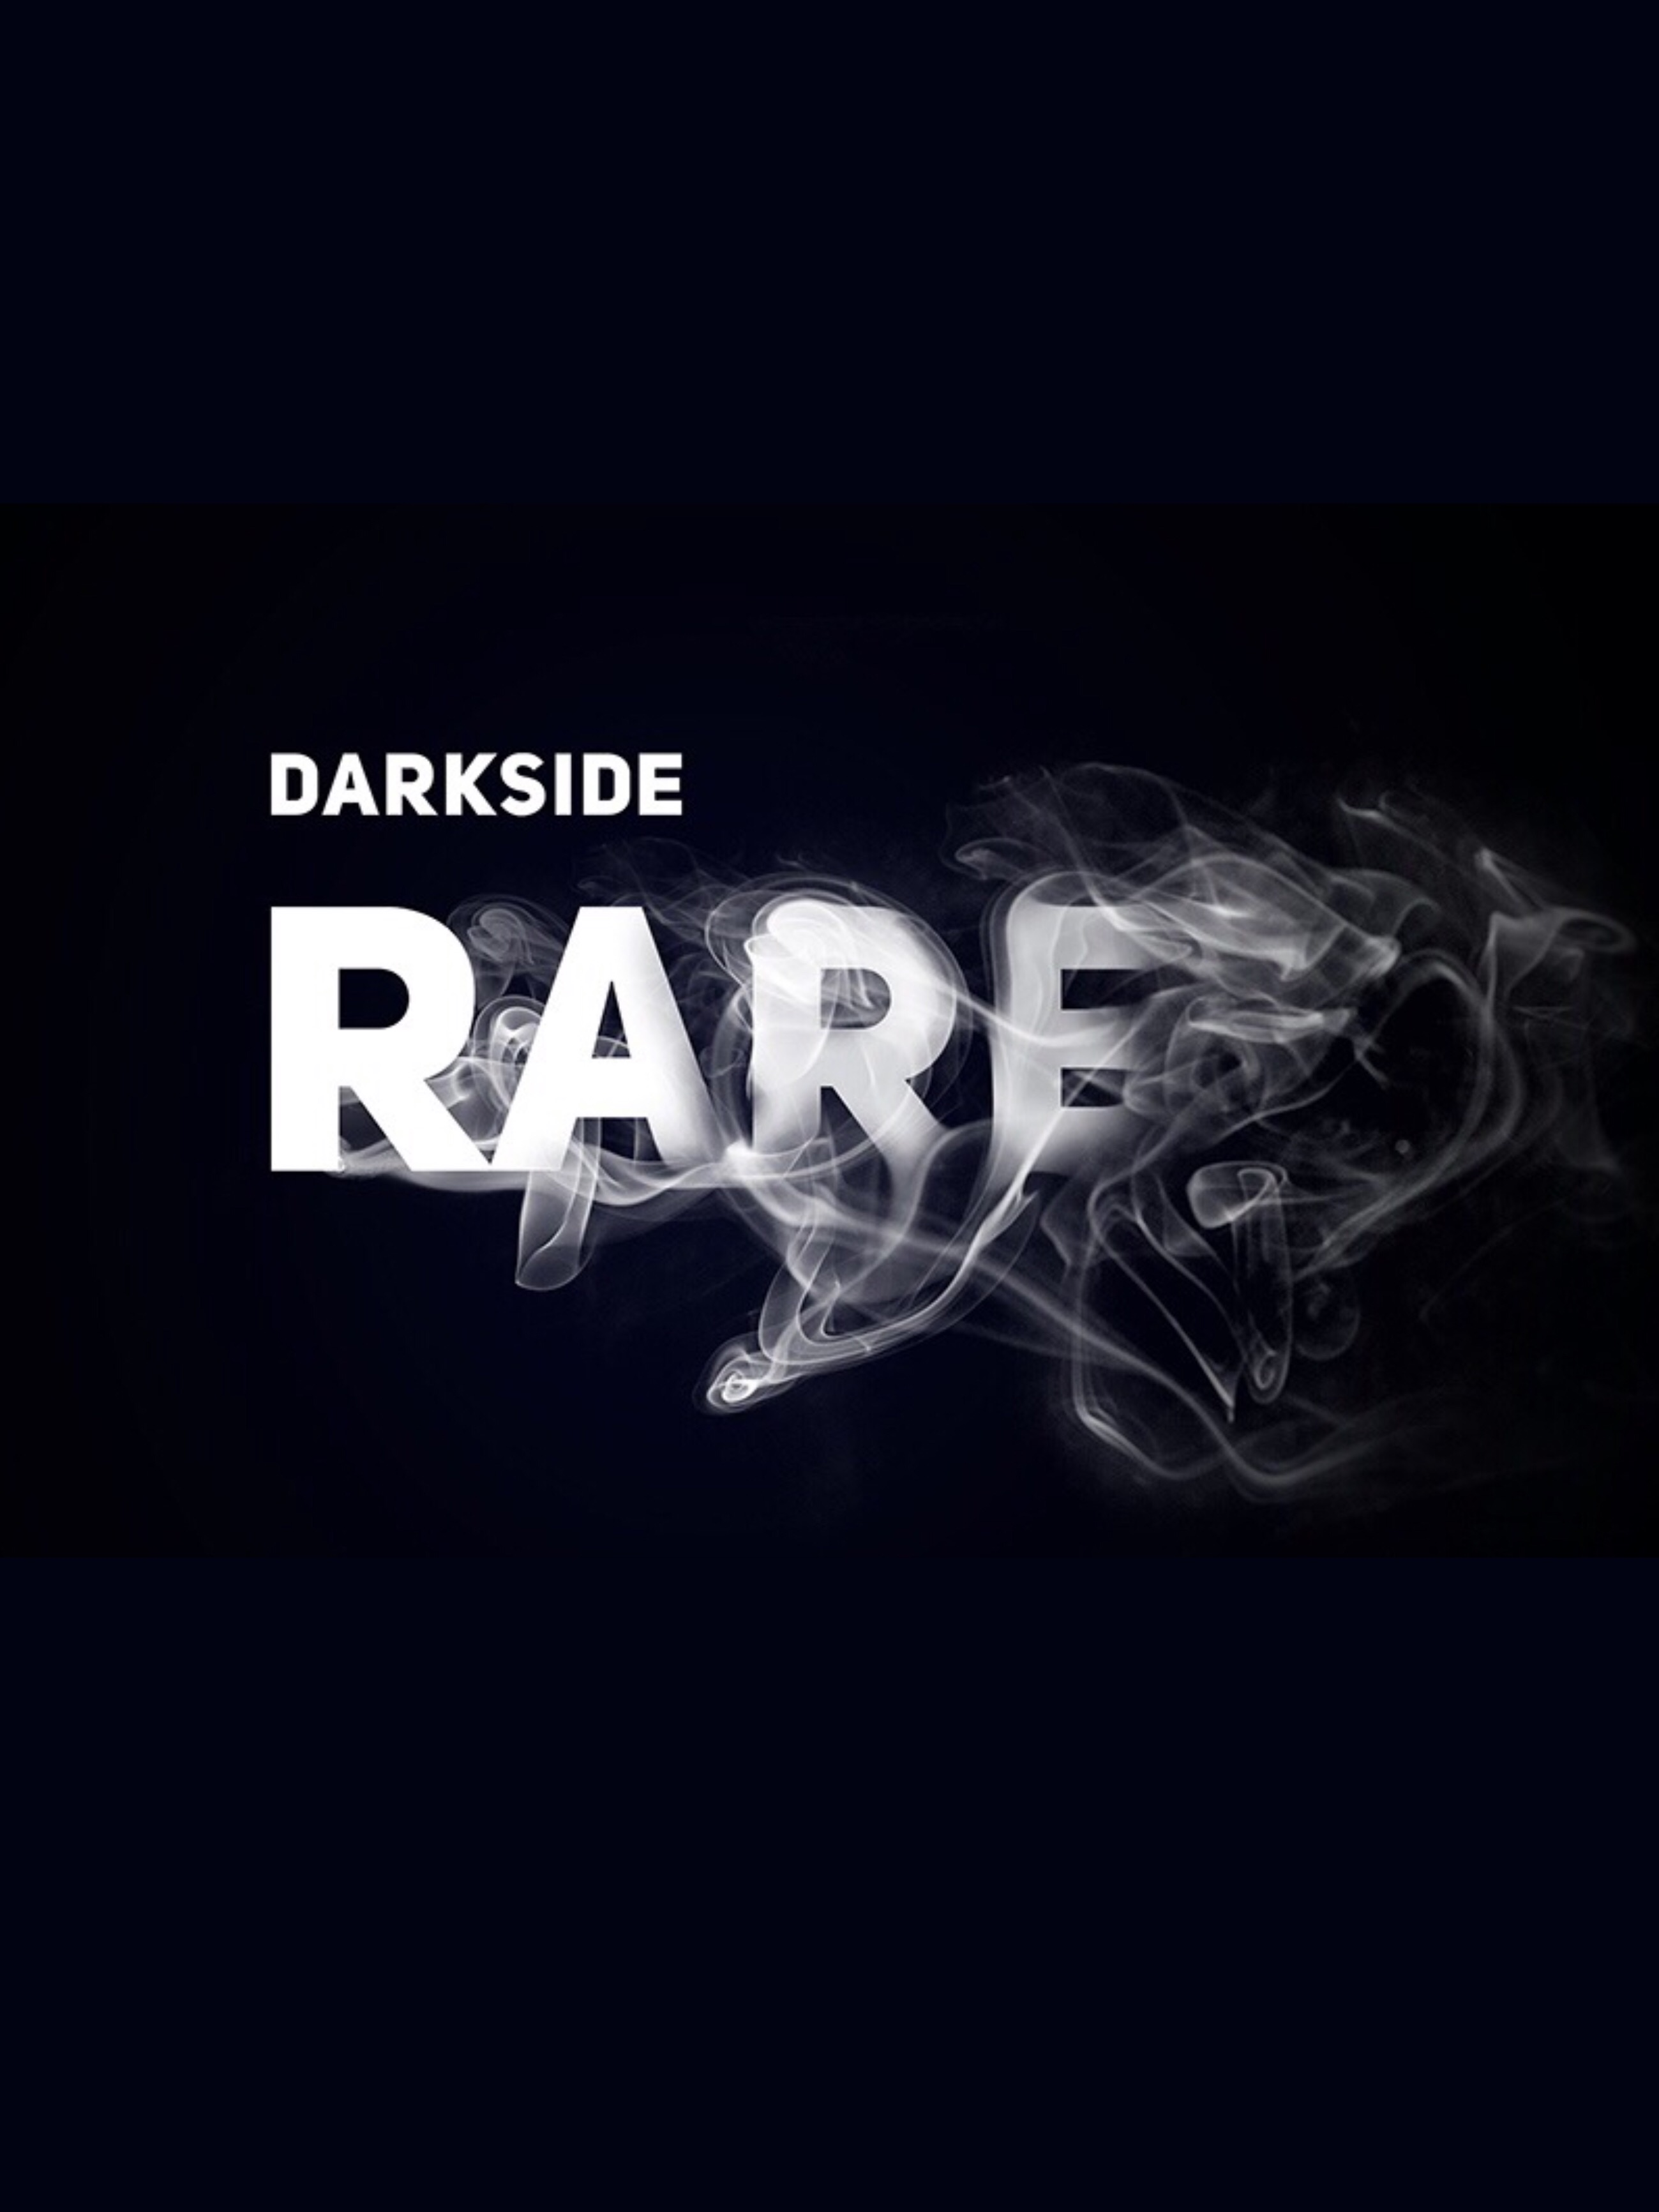 Darkside Rare